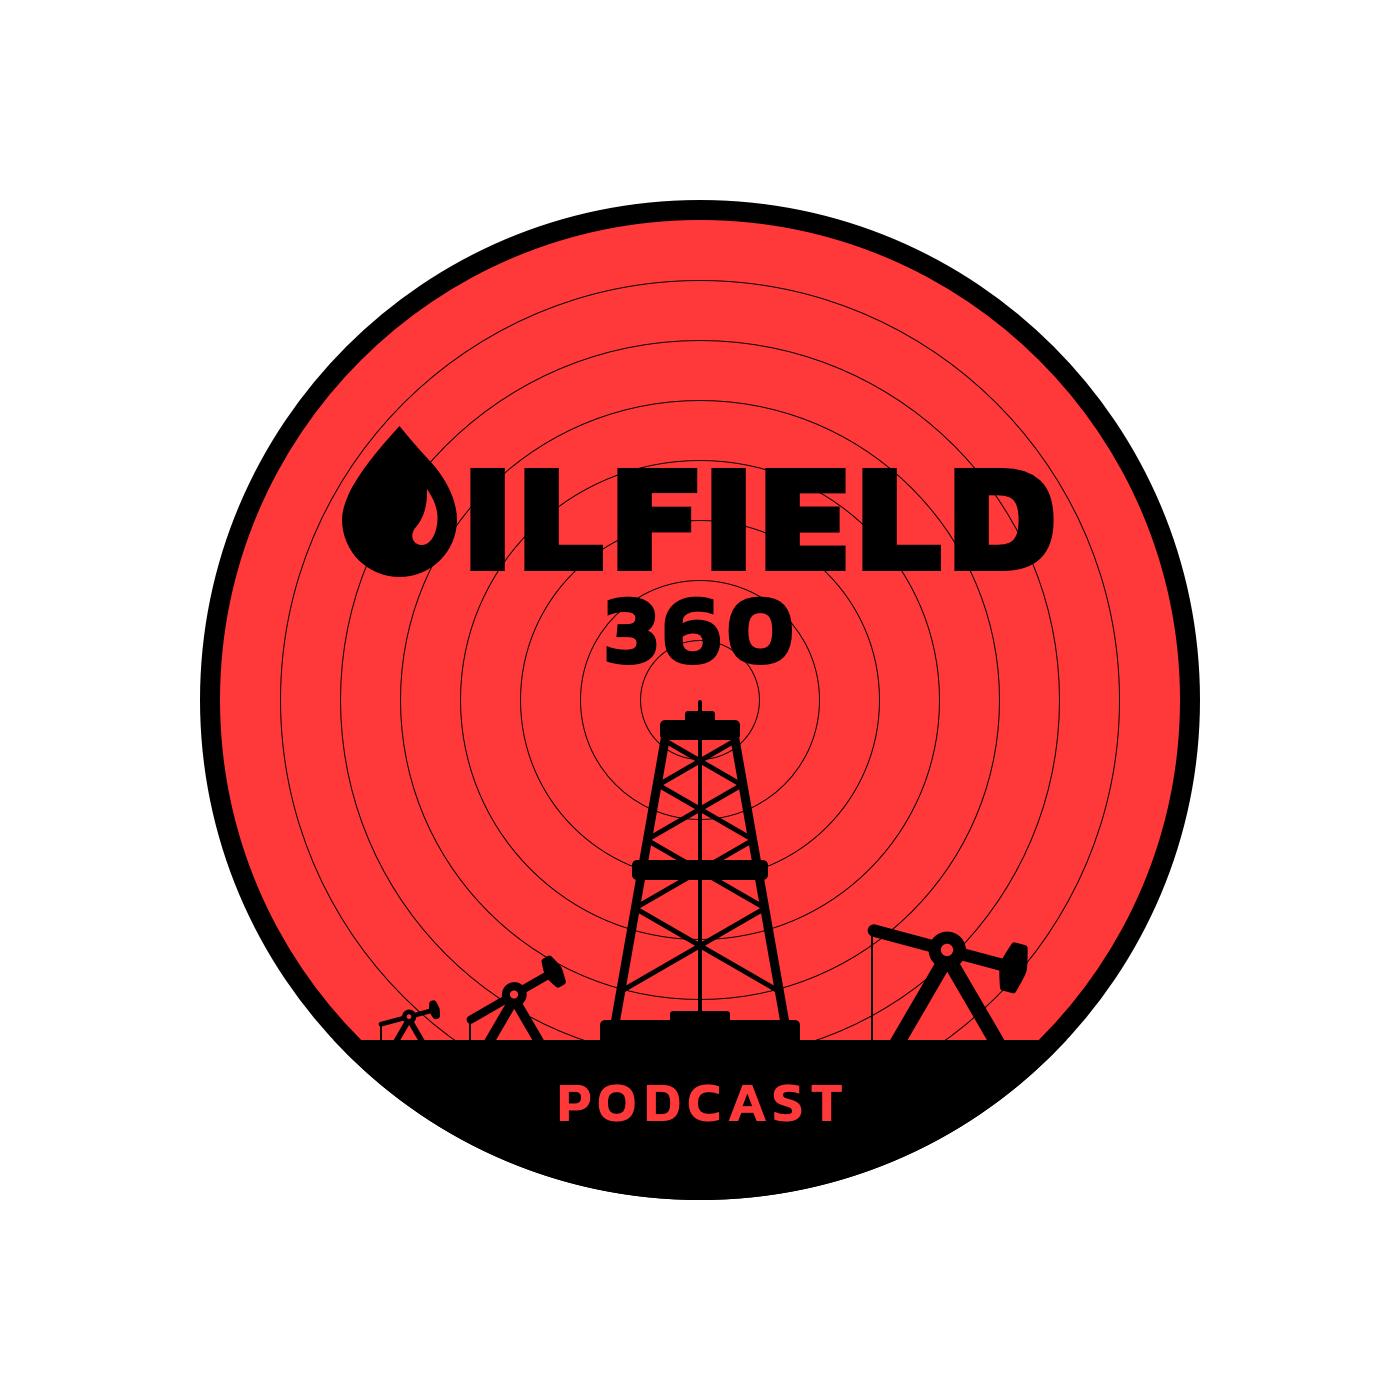 Oilfield 360 Podcast show art